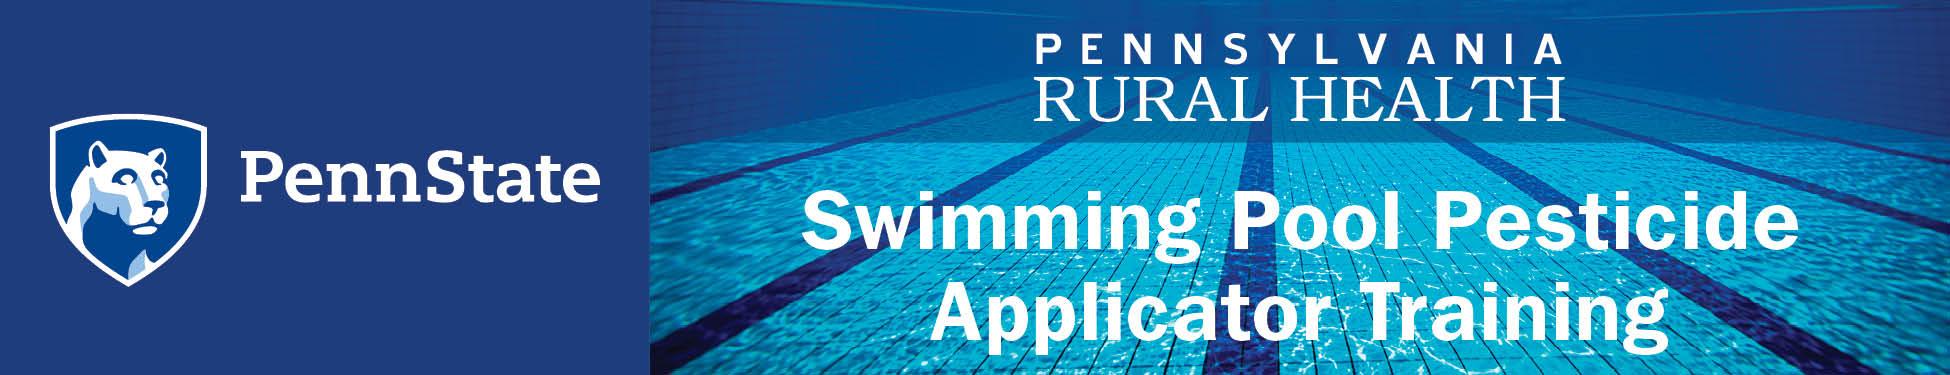 Swimming Pool Pesticide Applicator Training - WEBINAR